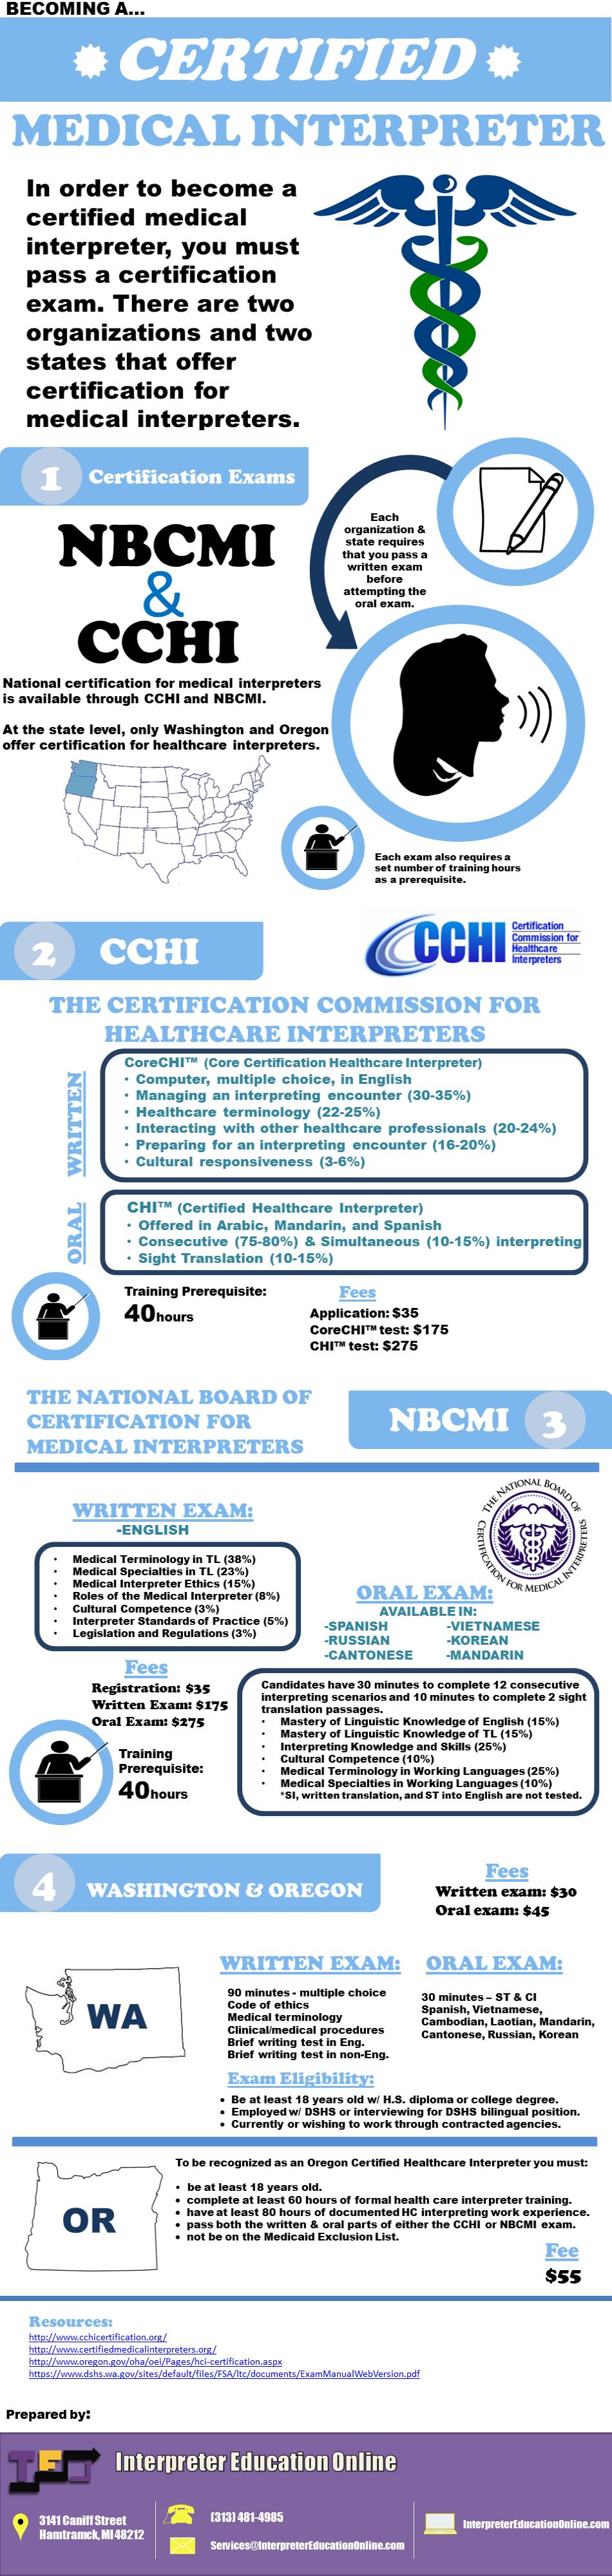 Becoming a Certified Medical Interpreter